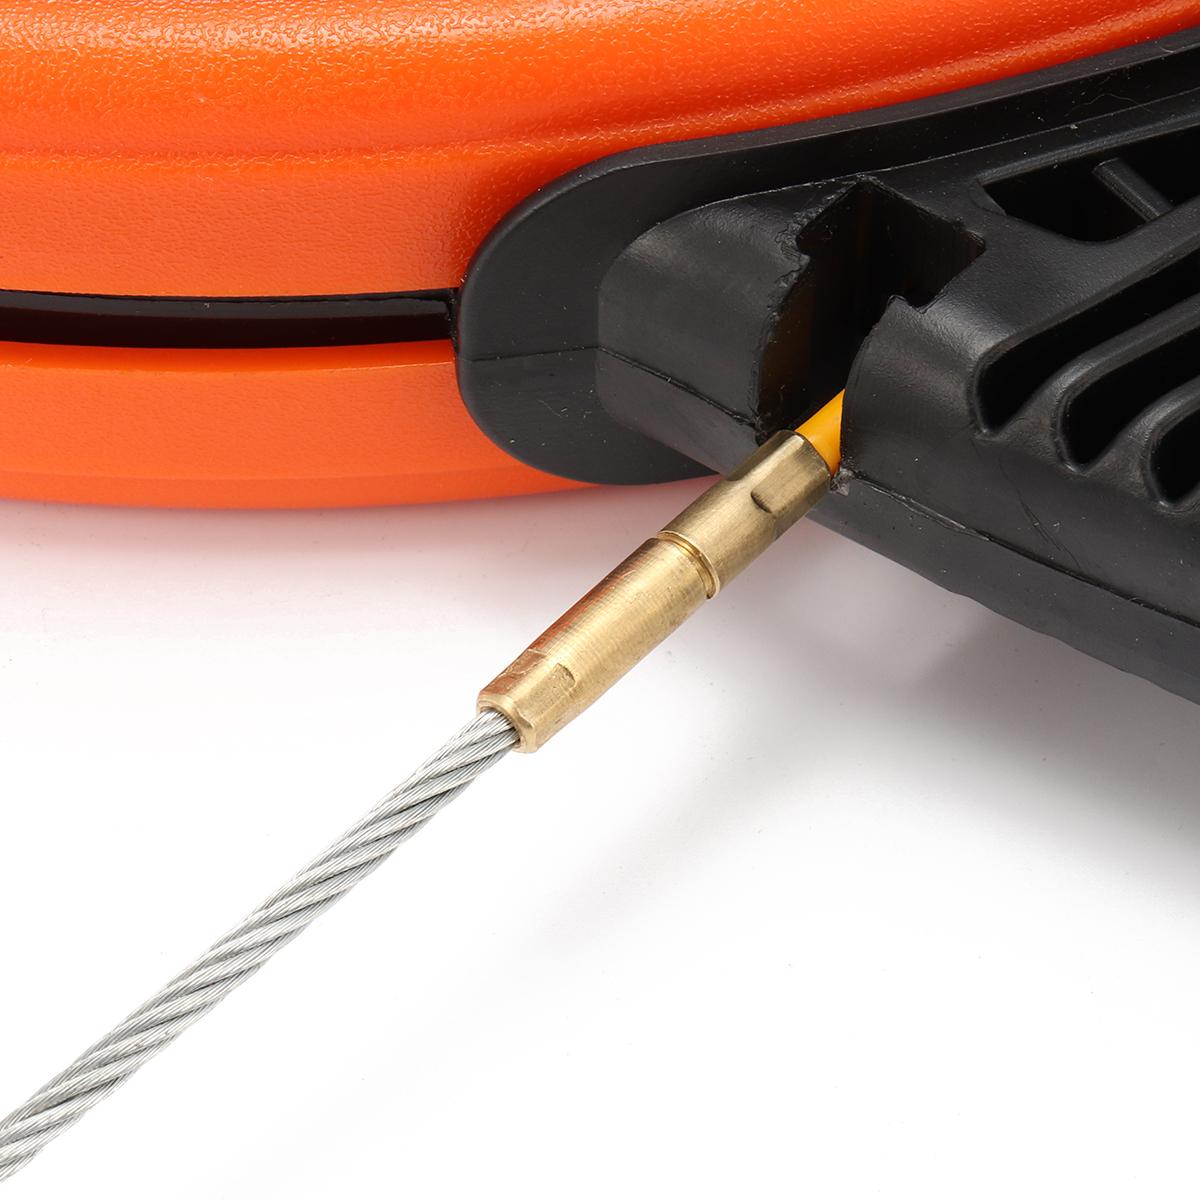 5efeef53 45ac 4d35 8dee 2c1fe3ff6db6 45m/60m/75m Fiberglass Cable Puller Fish Tape Reel